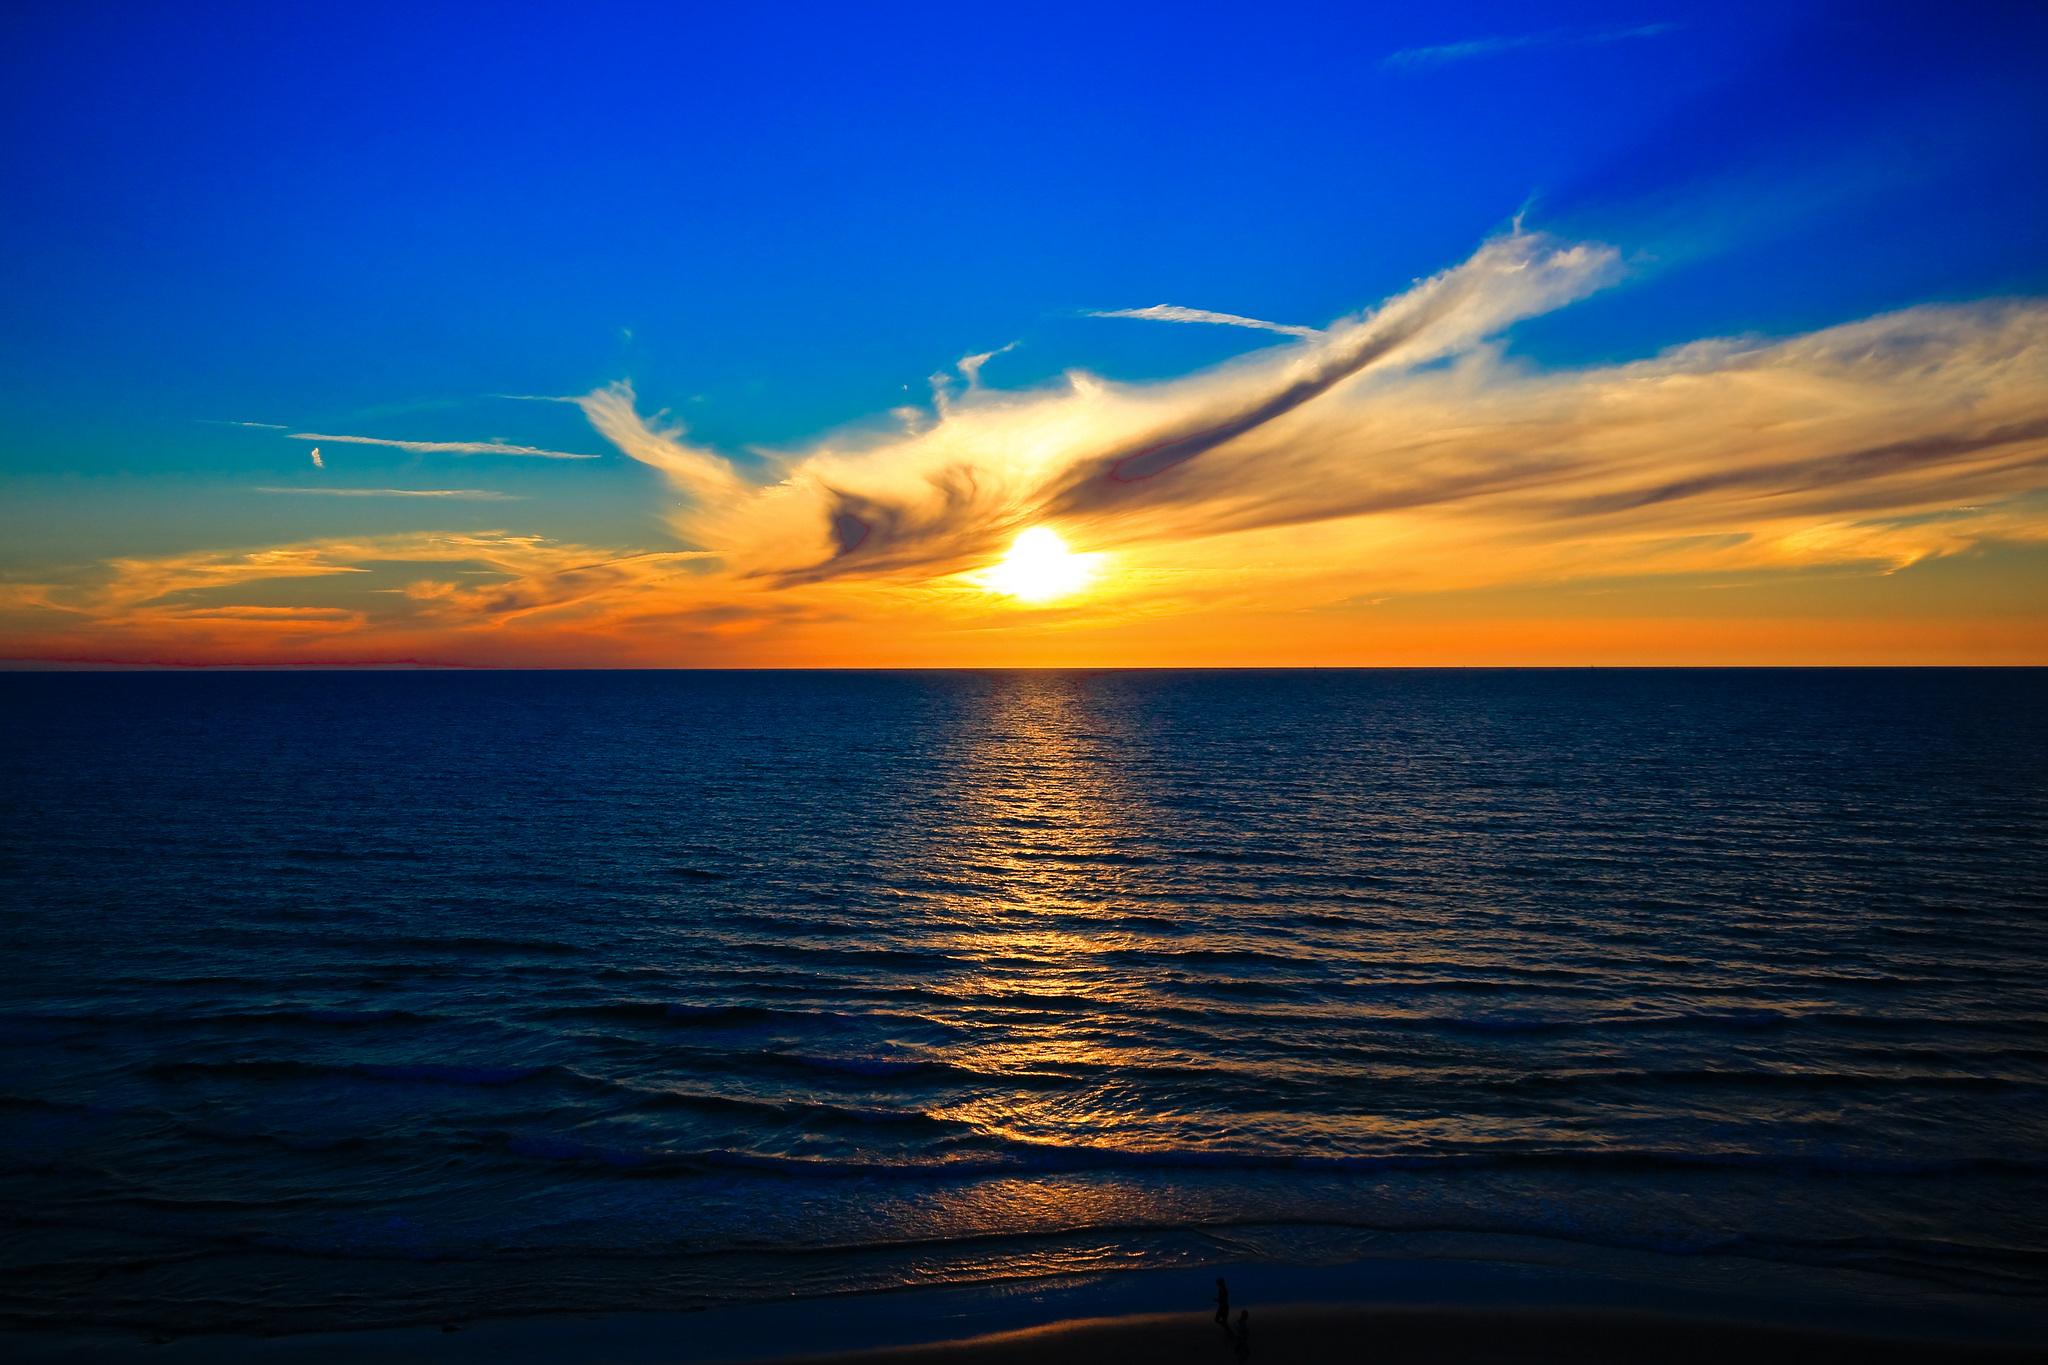 природа горизонт облака небо море nature horizon clouds the sky sea  № 2761233 бесплатно